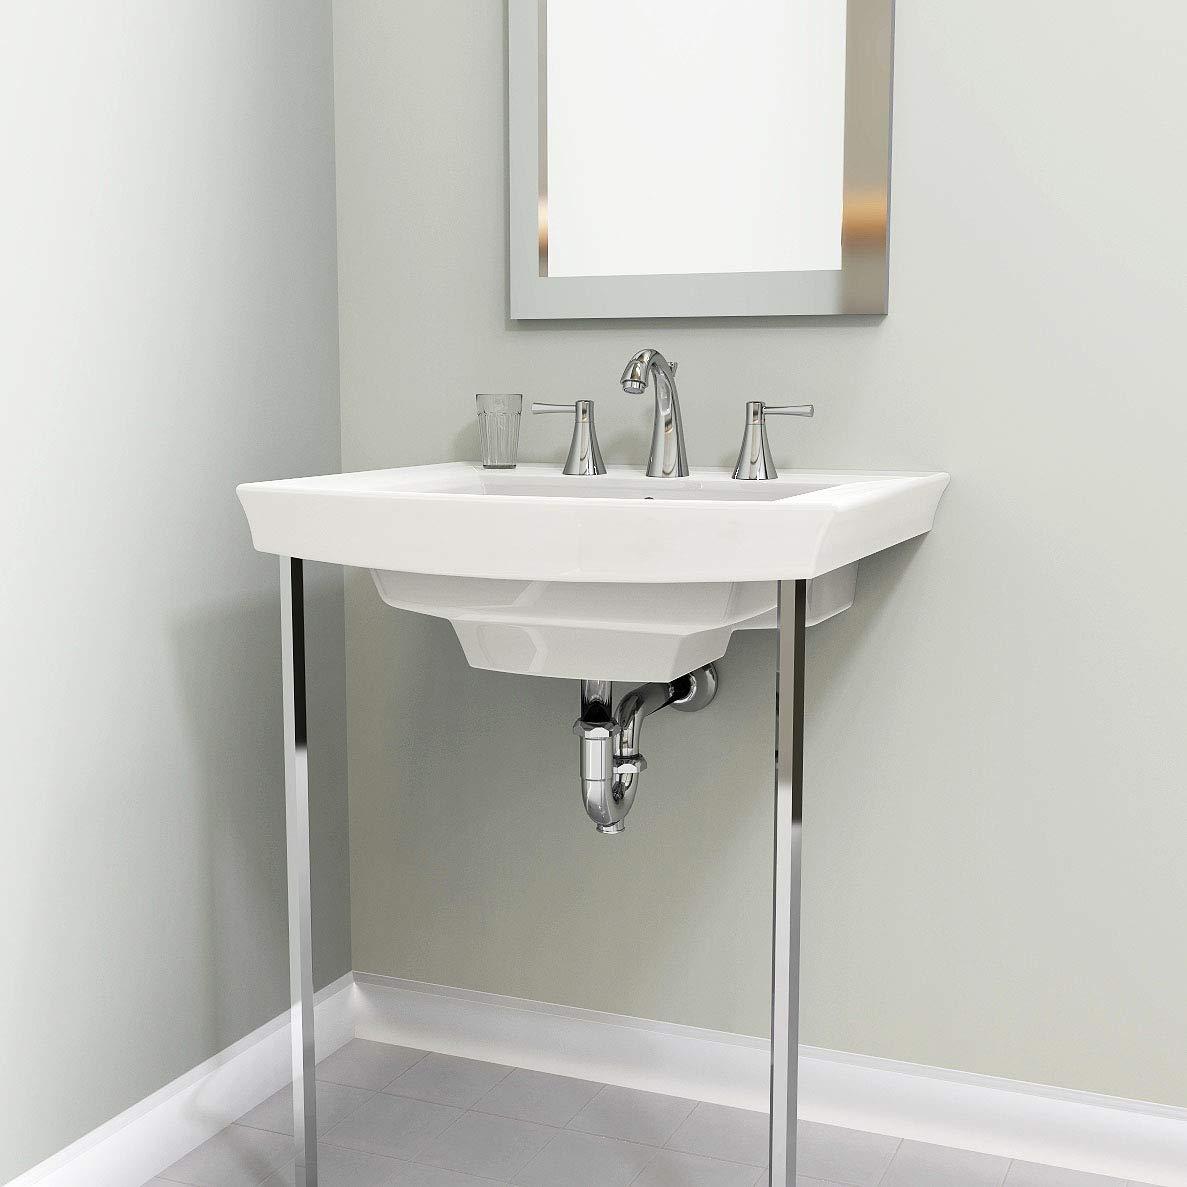 Plumb Pak PP22680 Sink Leg, 28 In In, Chrome by Plumb Pak